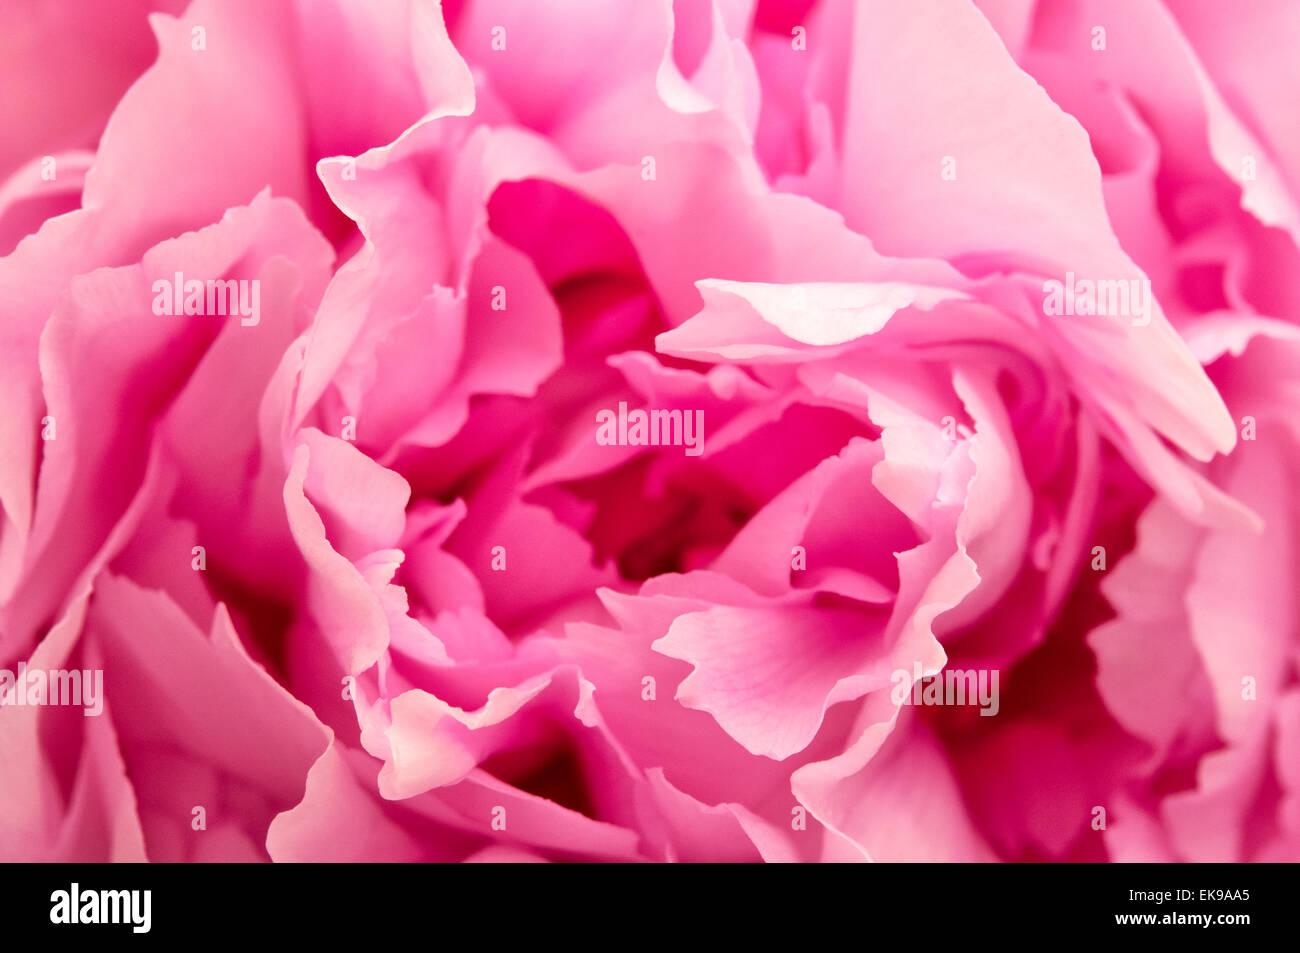 Nahaufnahme Bild von einer rosa Pfingstrose Stockbild